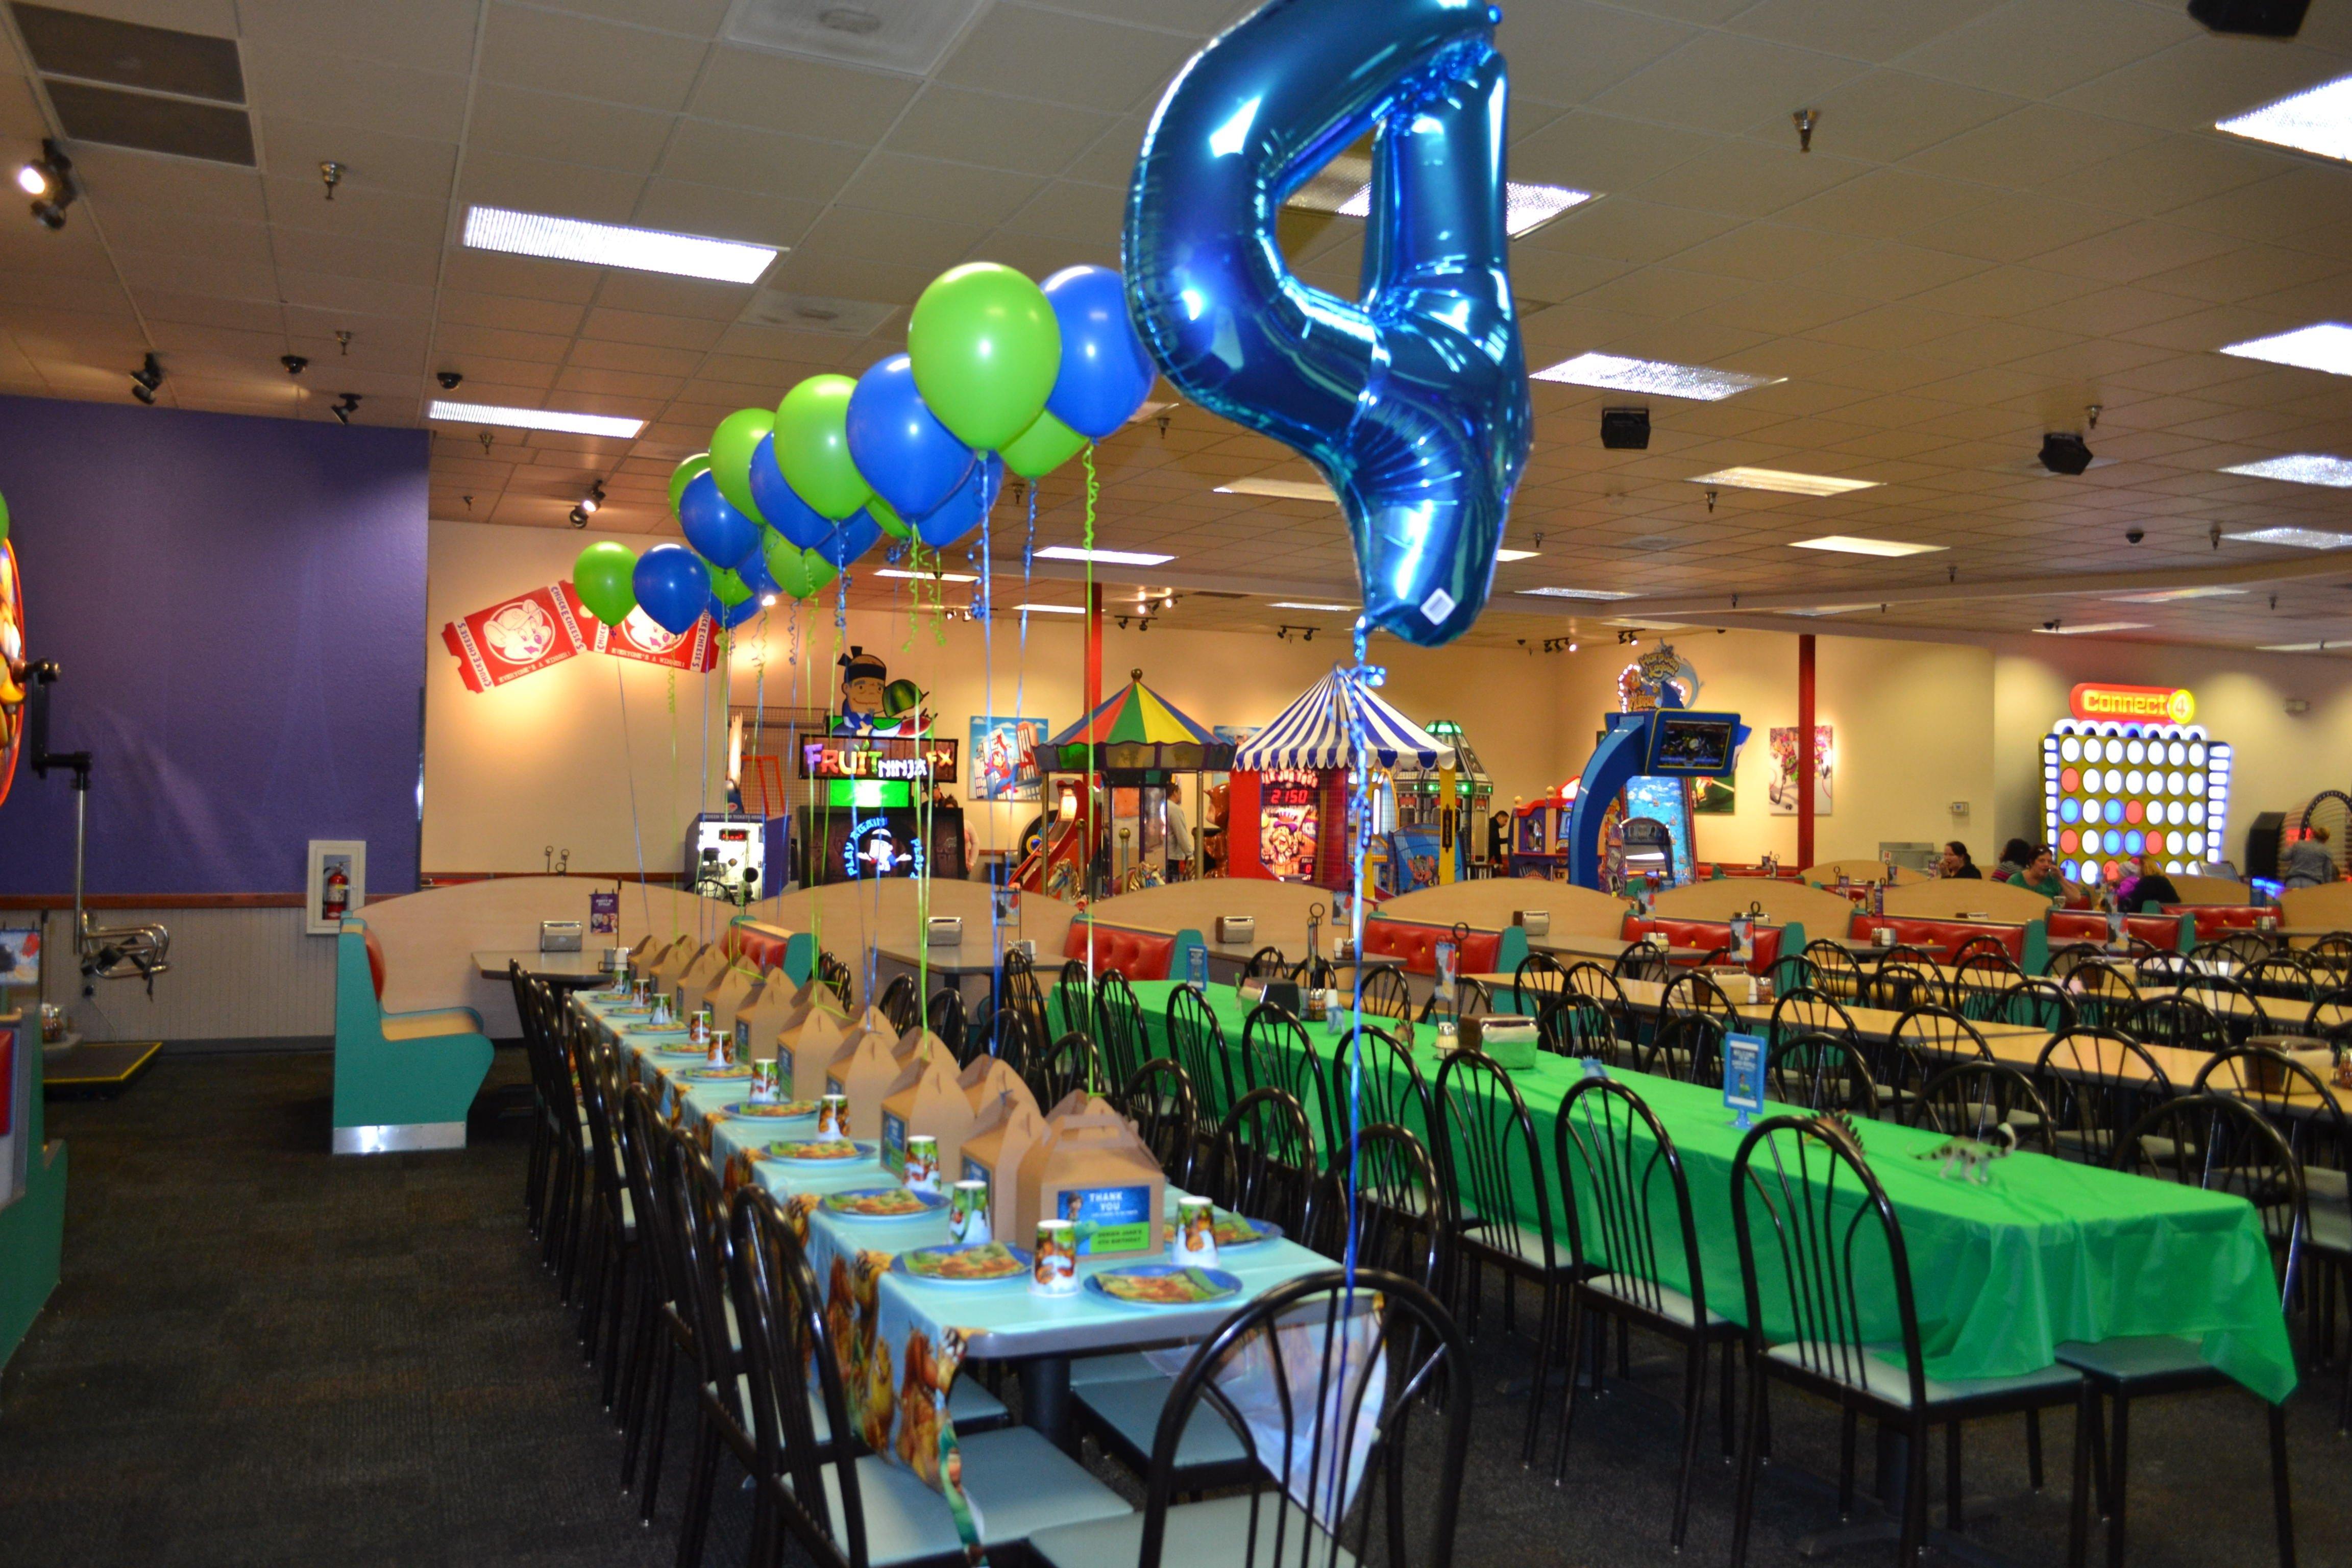 10 Elegant Chuck E Cheese Party Ideas djs 4th birthday chuck e cheese party the good dinosaur theme 2020